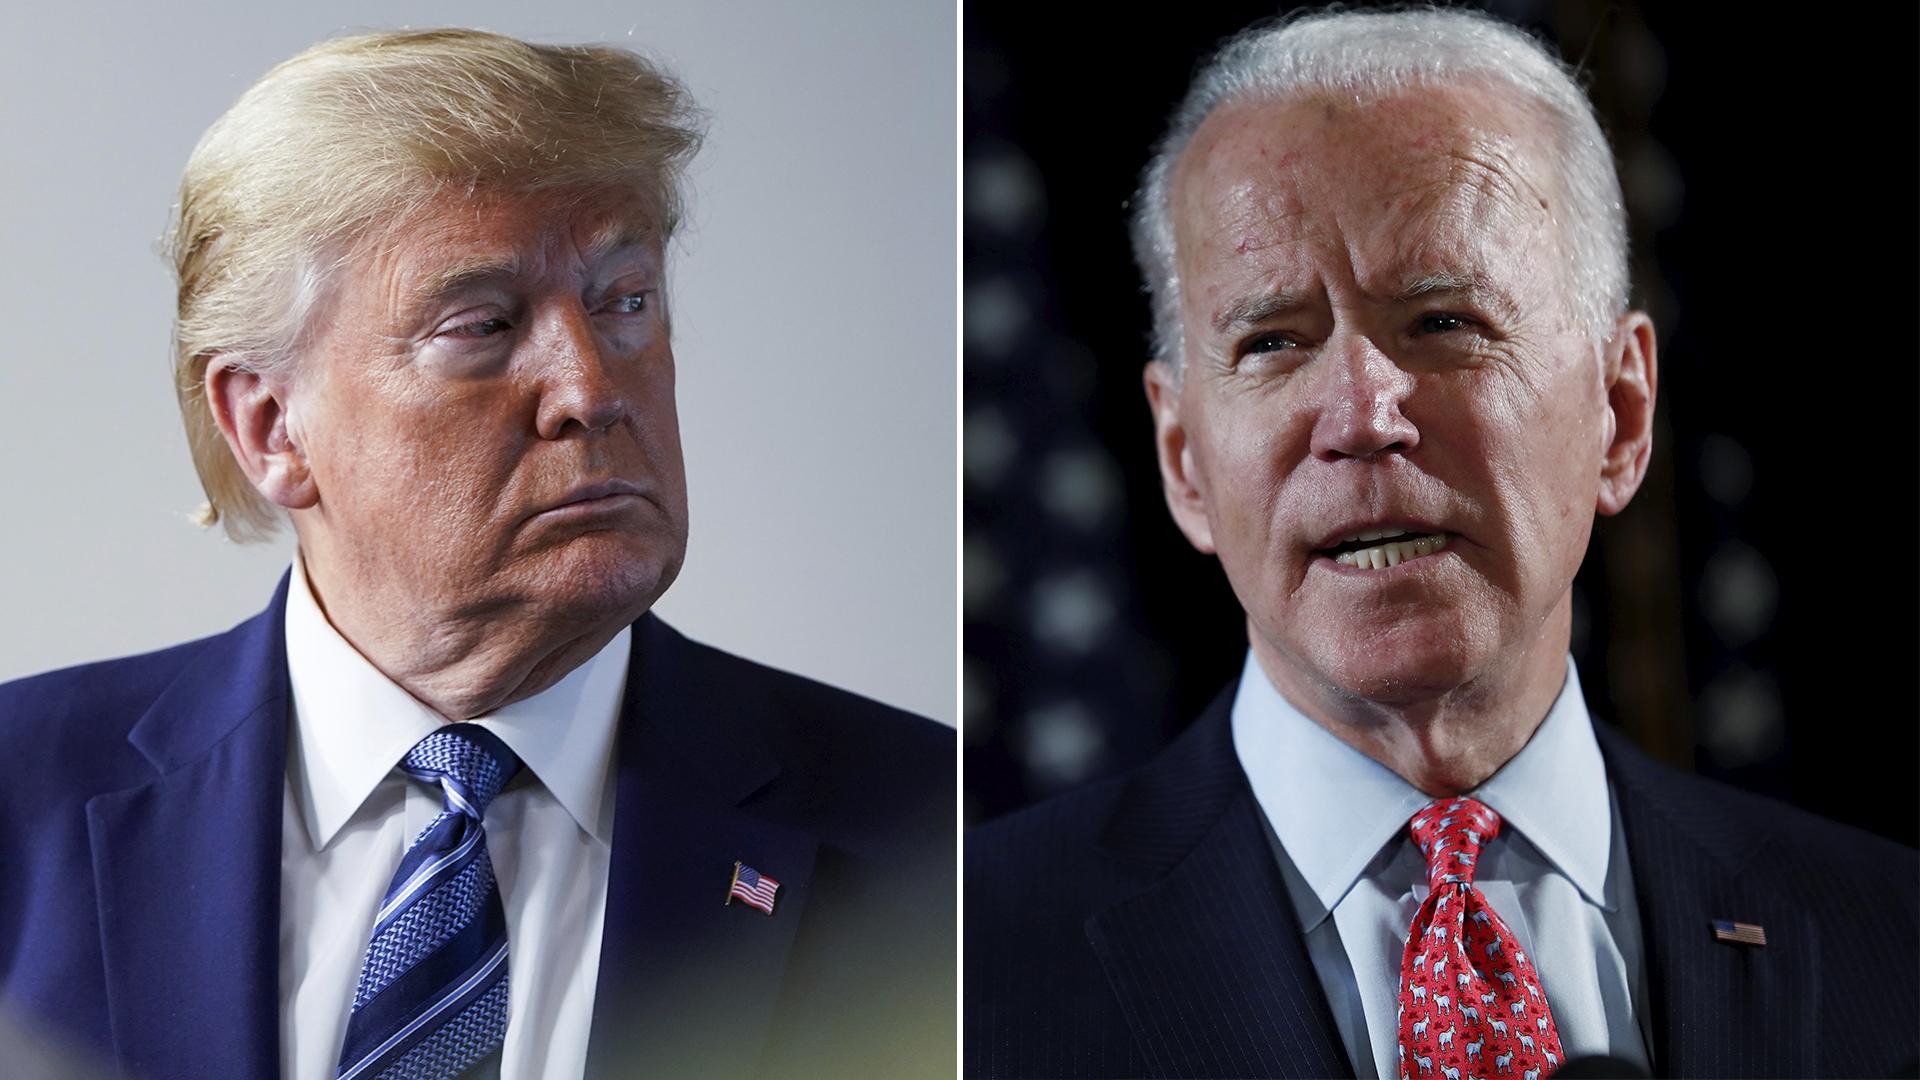 El dilema de los líderes del mundo: negociar con Donald Trump o esperar a Joe  Biden - Infobae